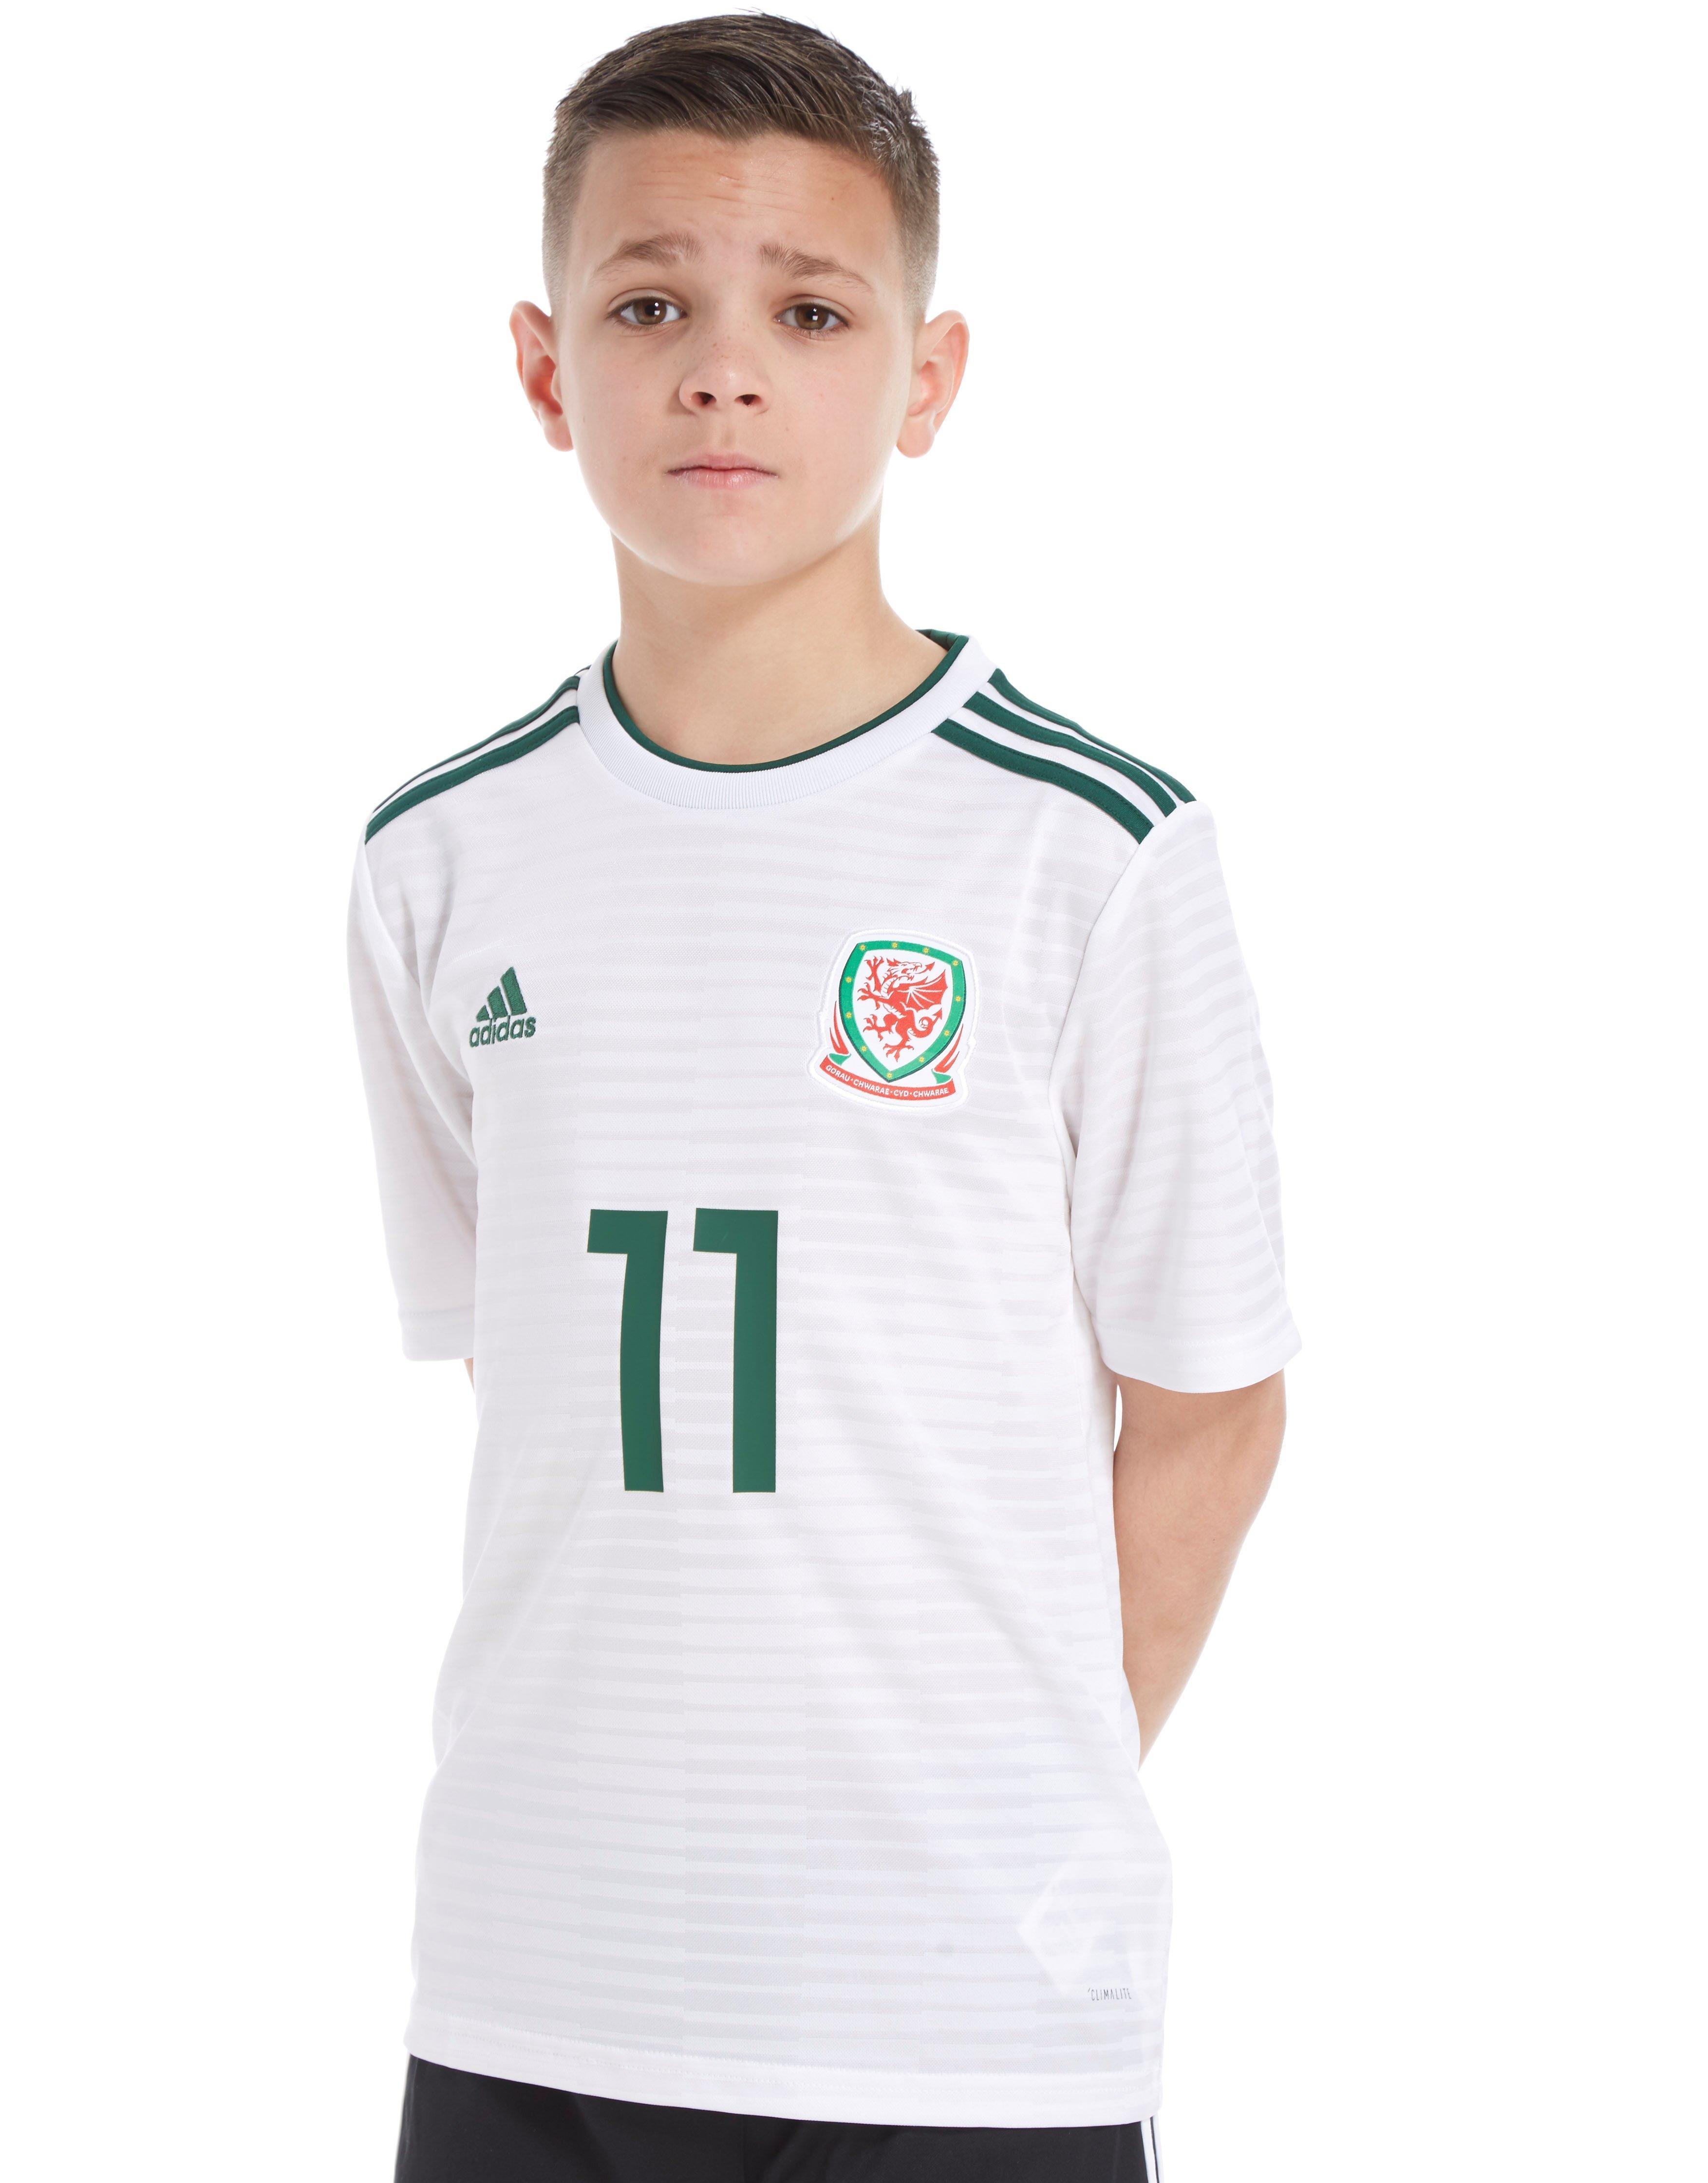 adidas Wales 2018 Away Bale #11 Shirt Junior